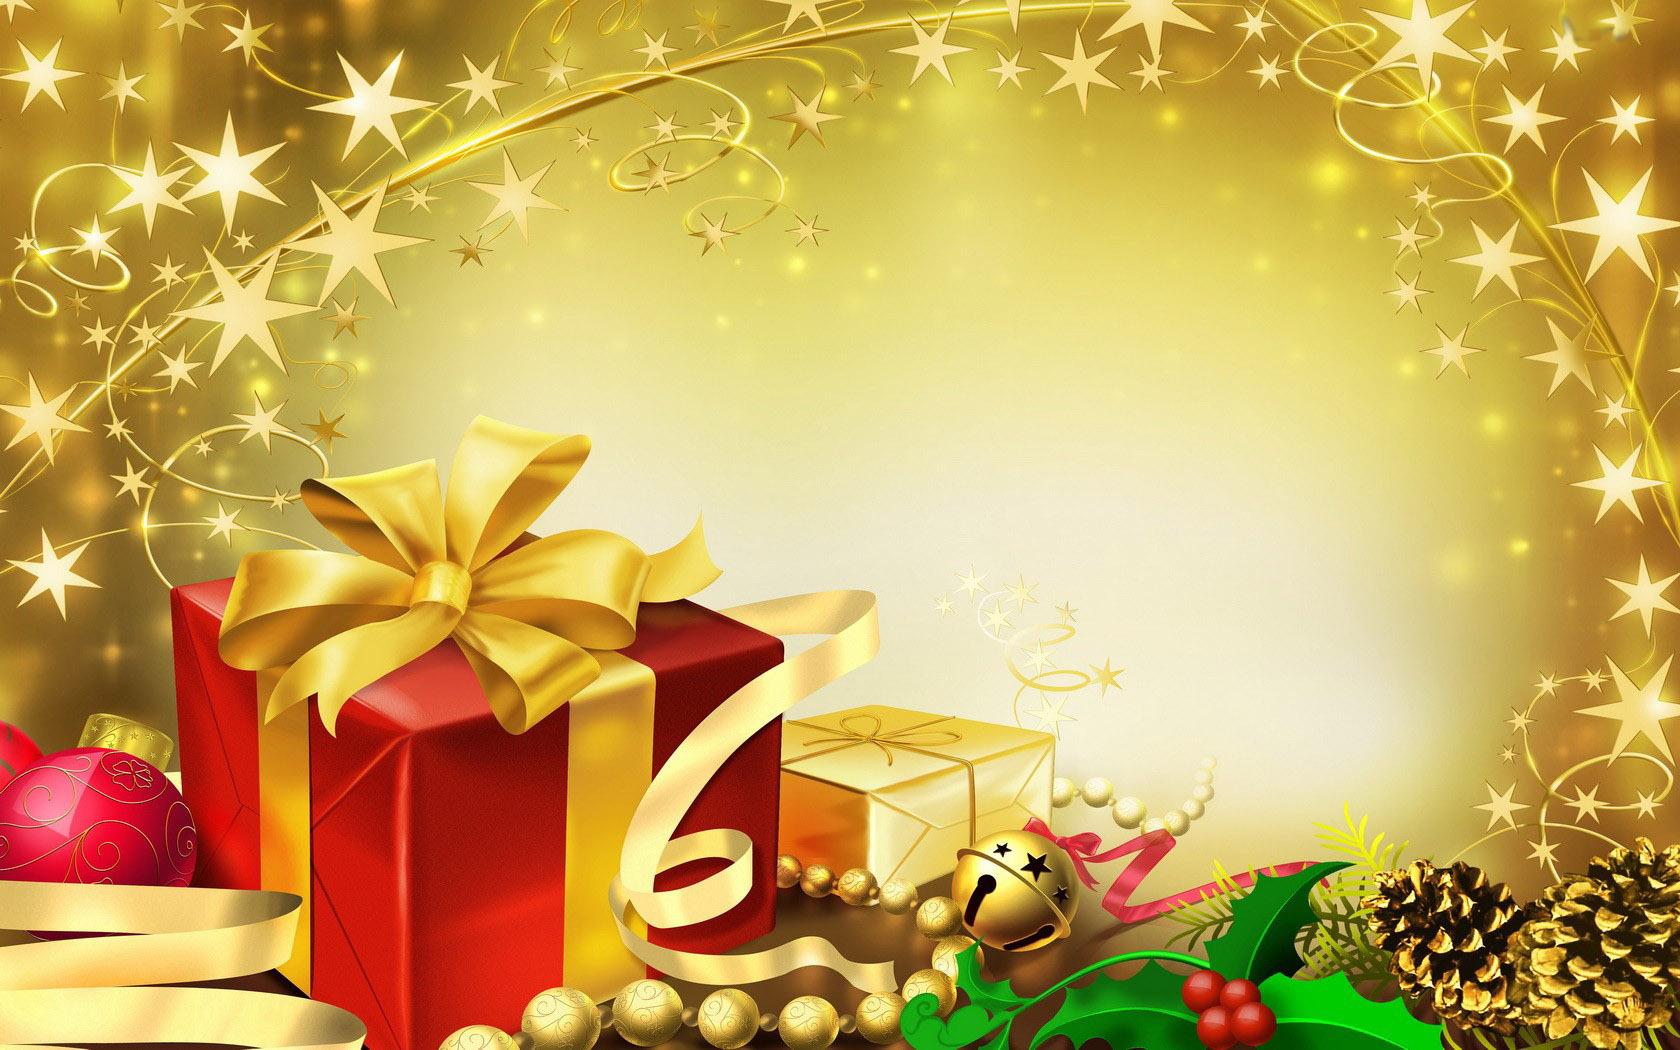 Christmas-Wallpaper-free-hd-for-desktop